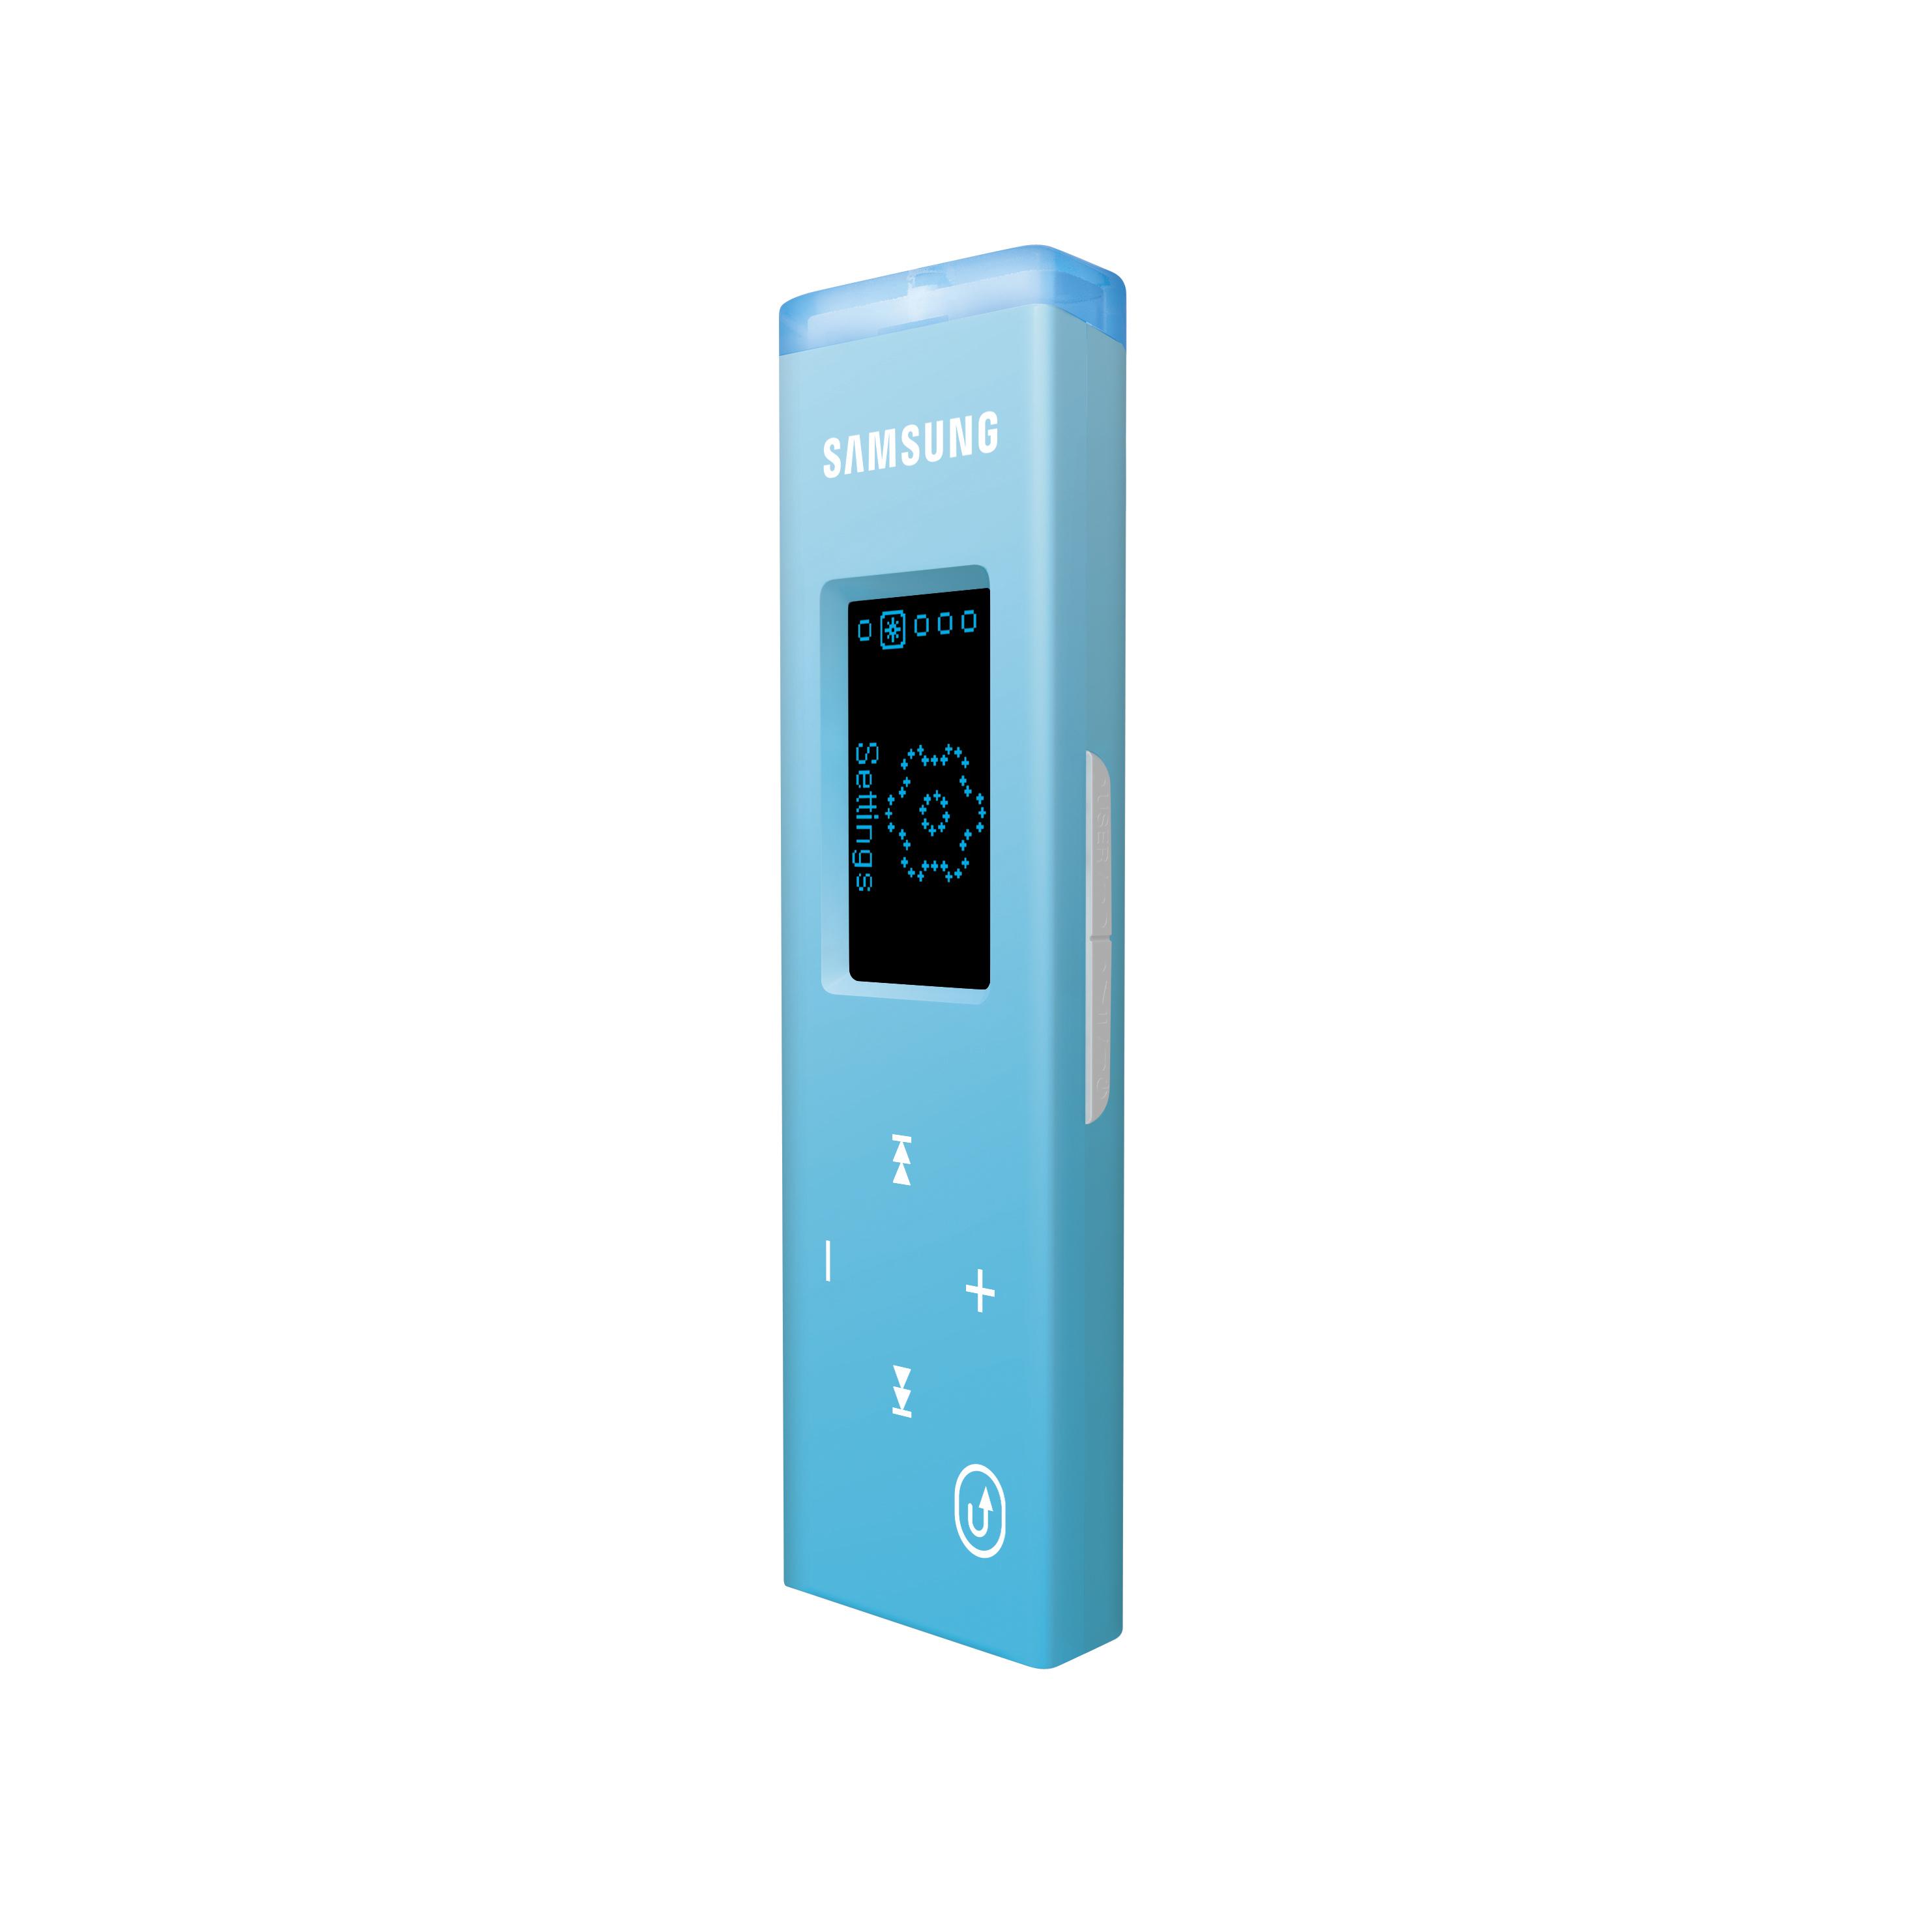 Closer Look: Samsung's New Crystal USB Audio Player